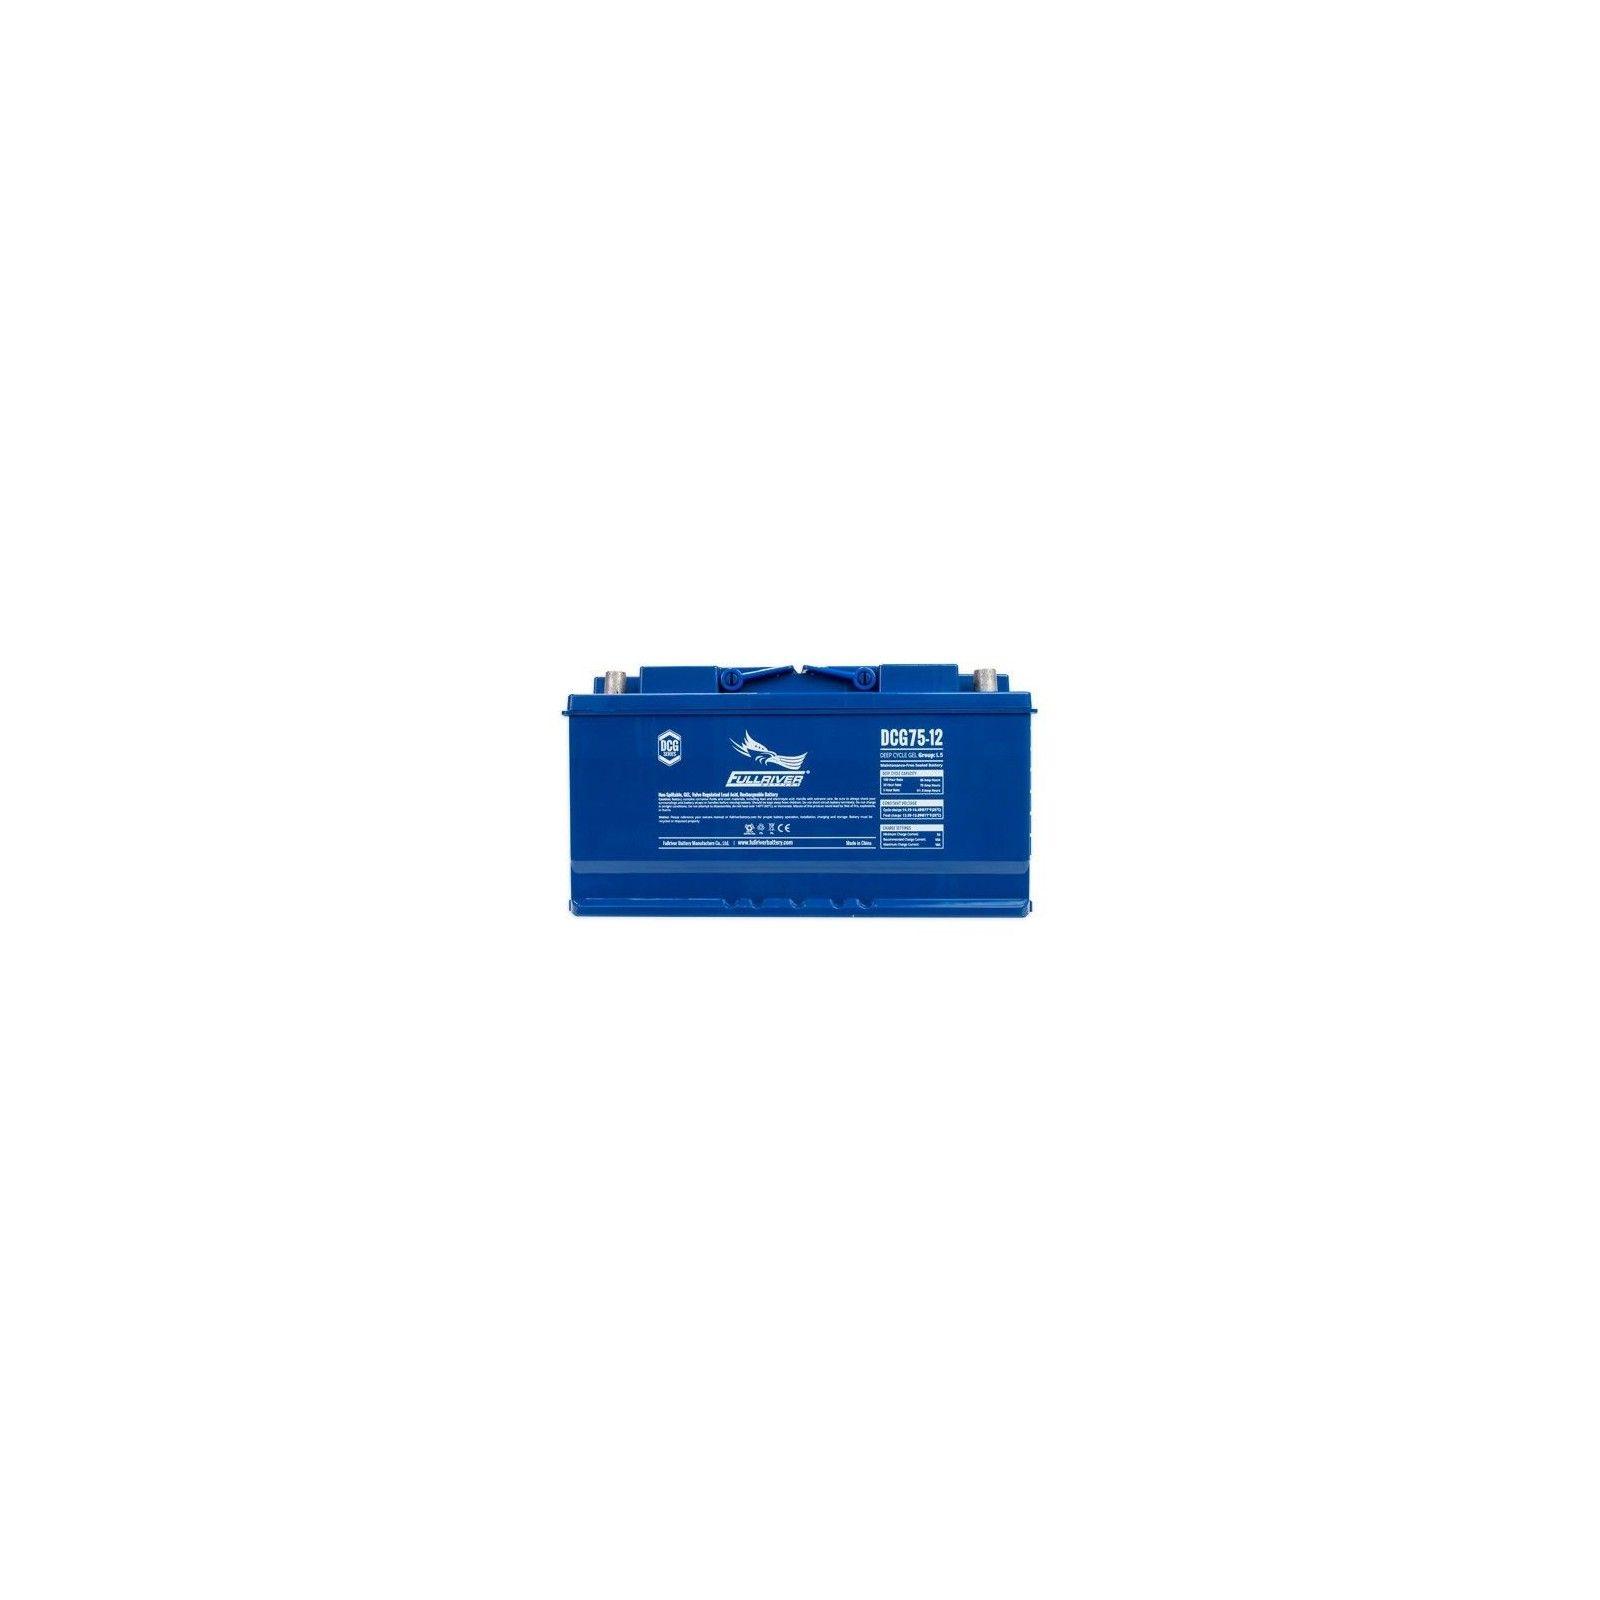 BATERIA Fullriver FULLRIVER DCG75-12 75Ah 12V FULLRIVER - 1